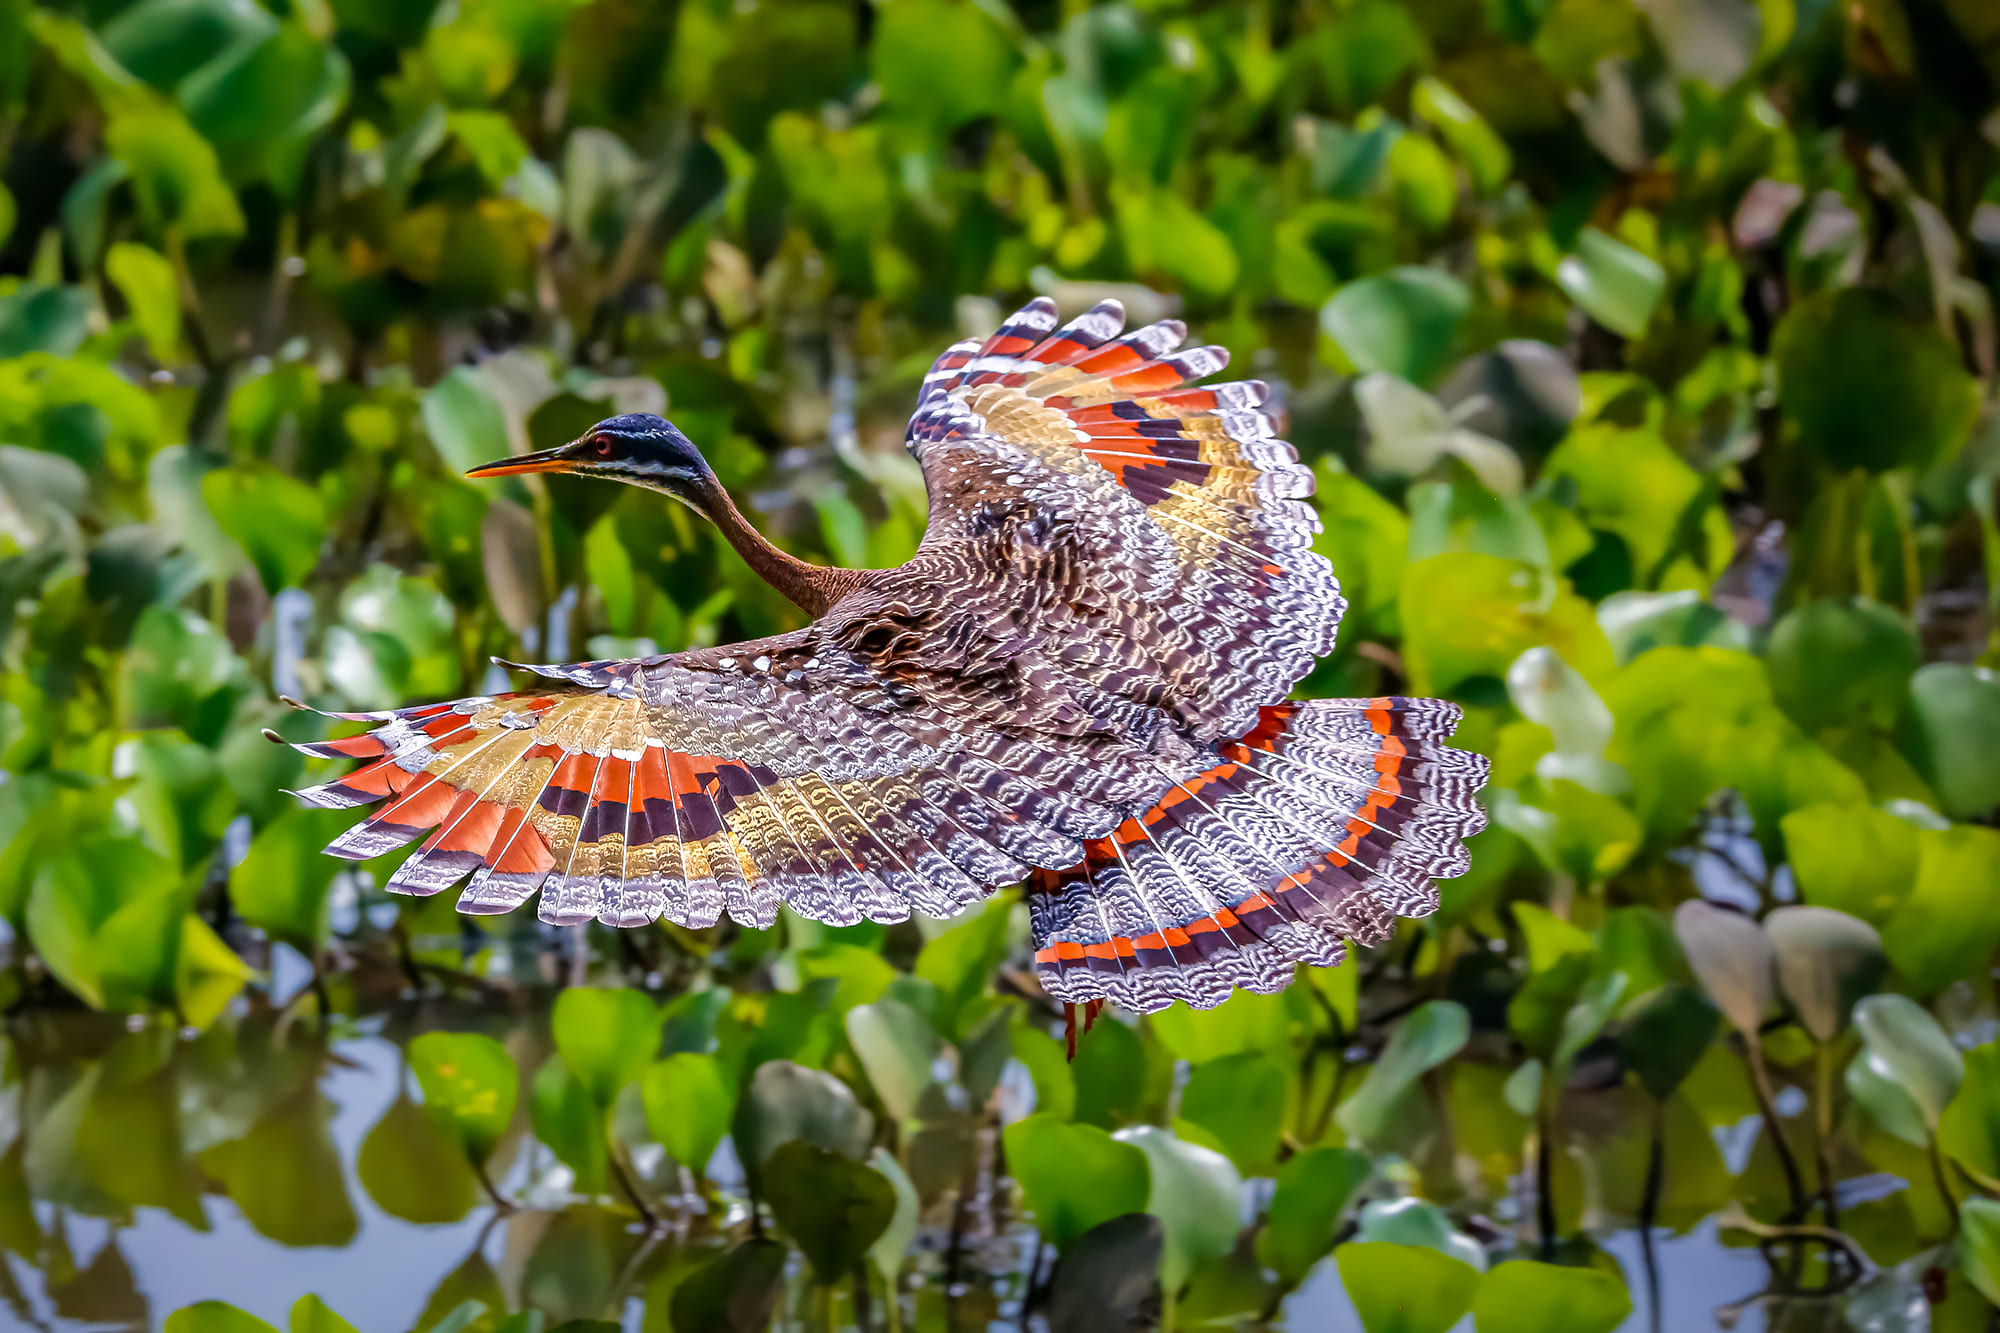 A Sunbittern bird in Brazil.